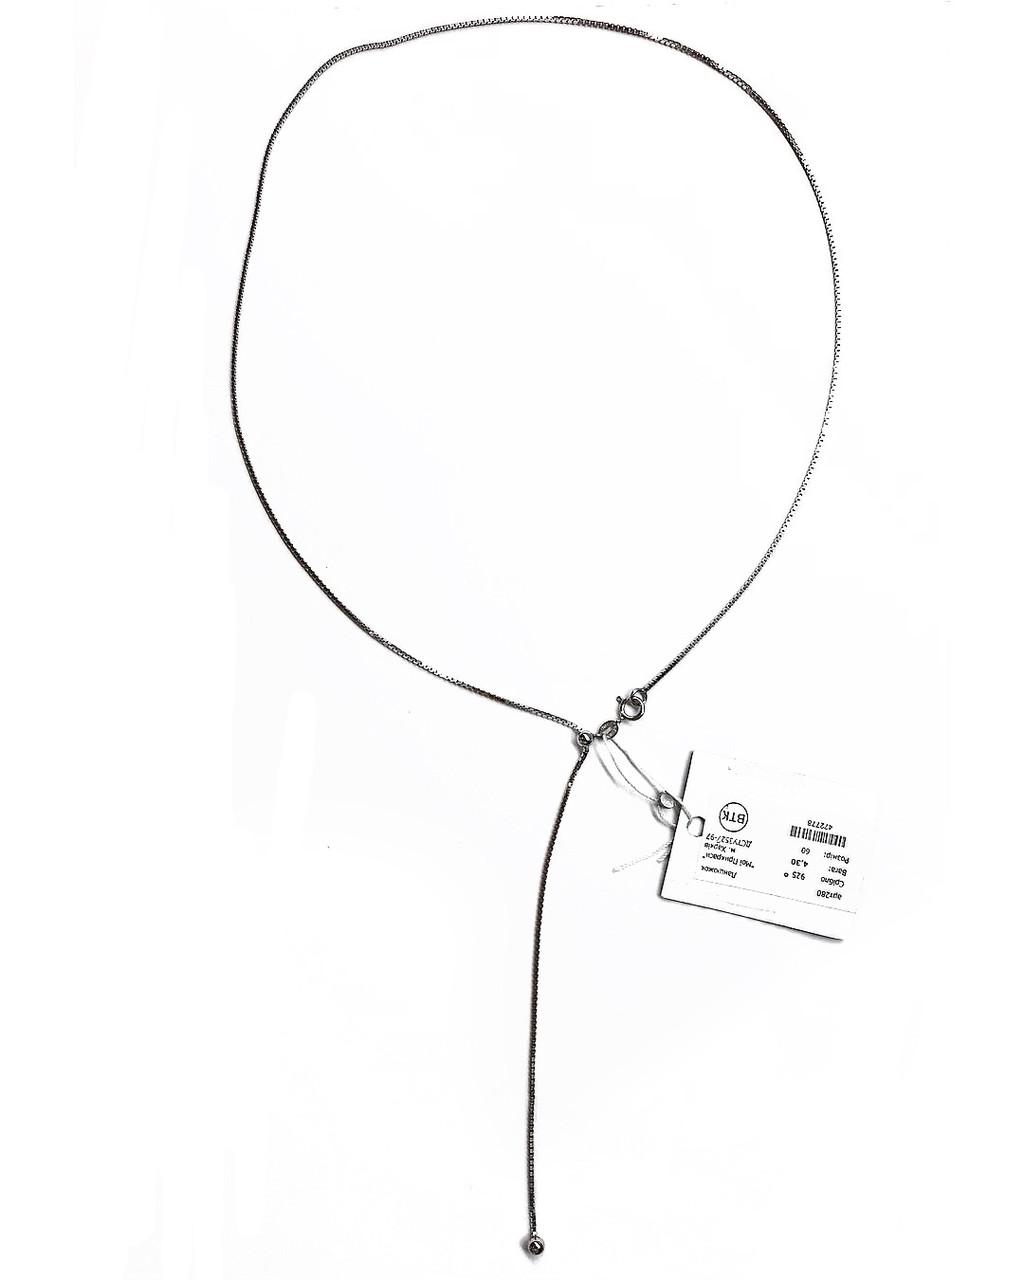 Цепочка из серебра 925 с регулятором длинны Beauty Jewels плетение поп-корн